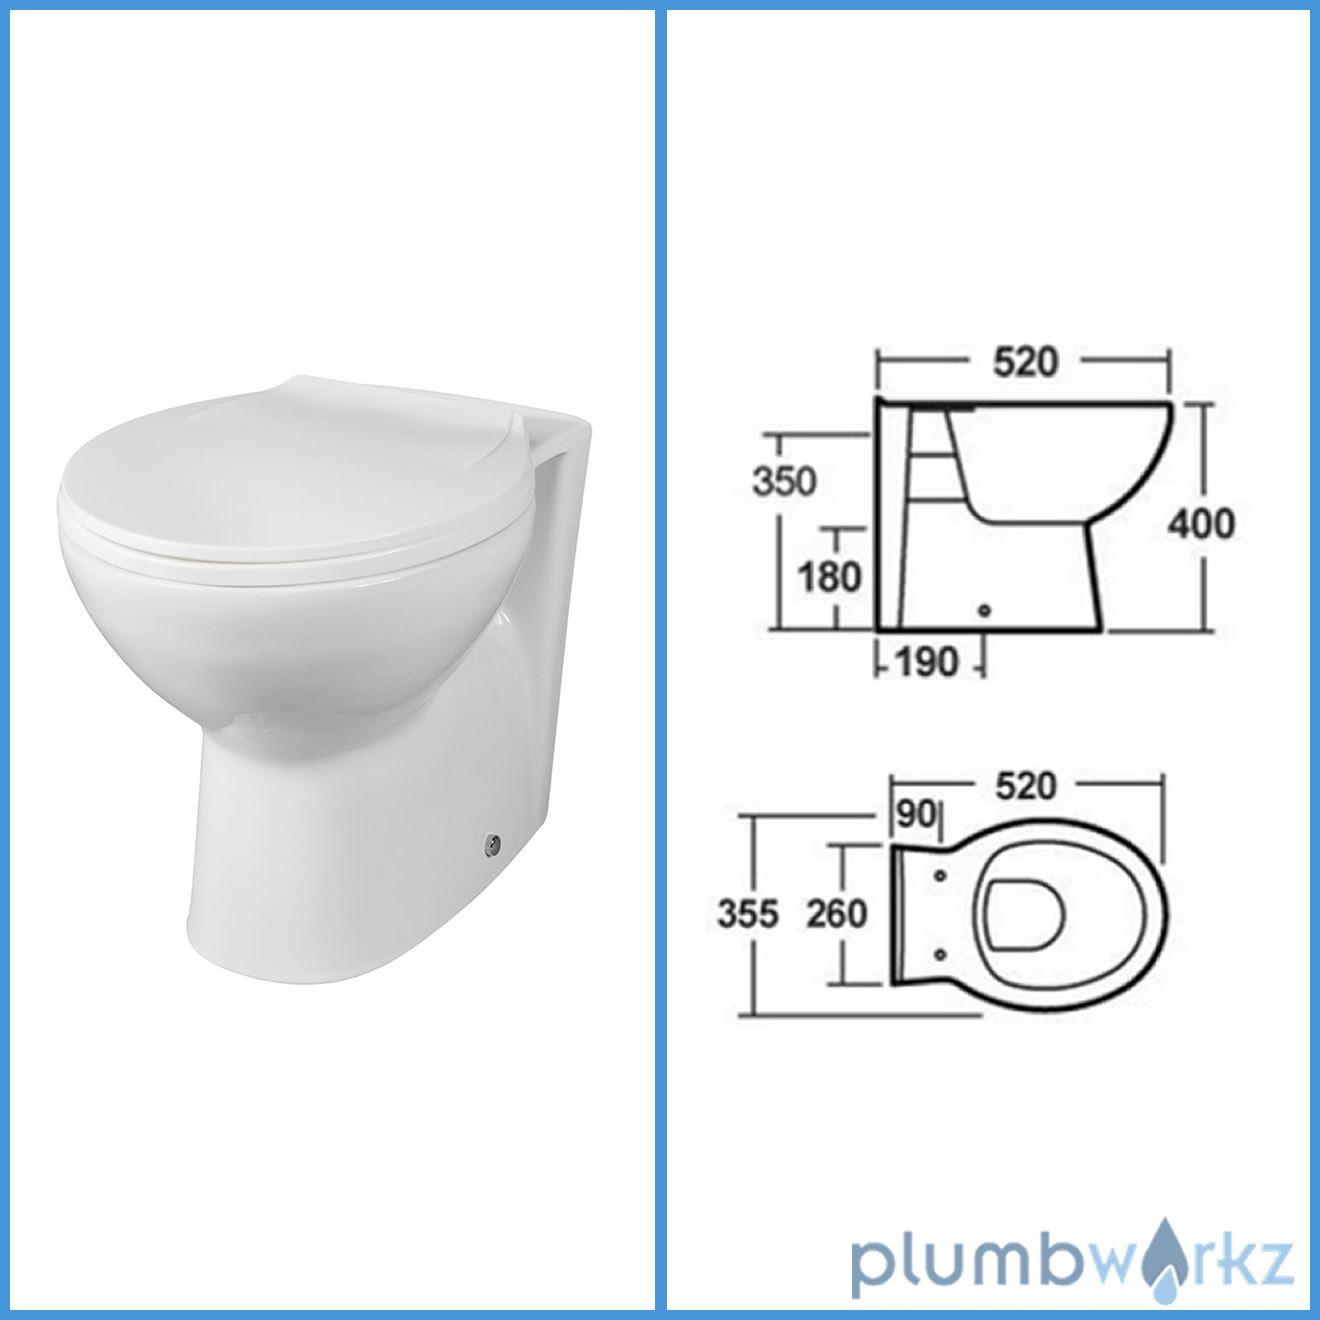 Bathroom Suites Ebay L Shape Anthracite Bathroom Furniture Suite Basin Btw Toilet